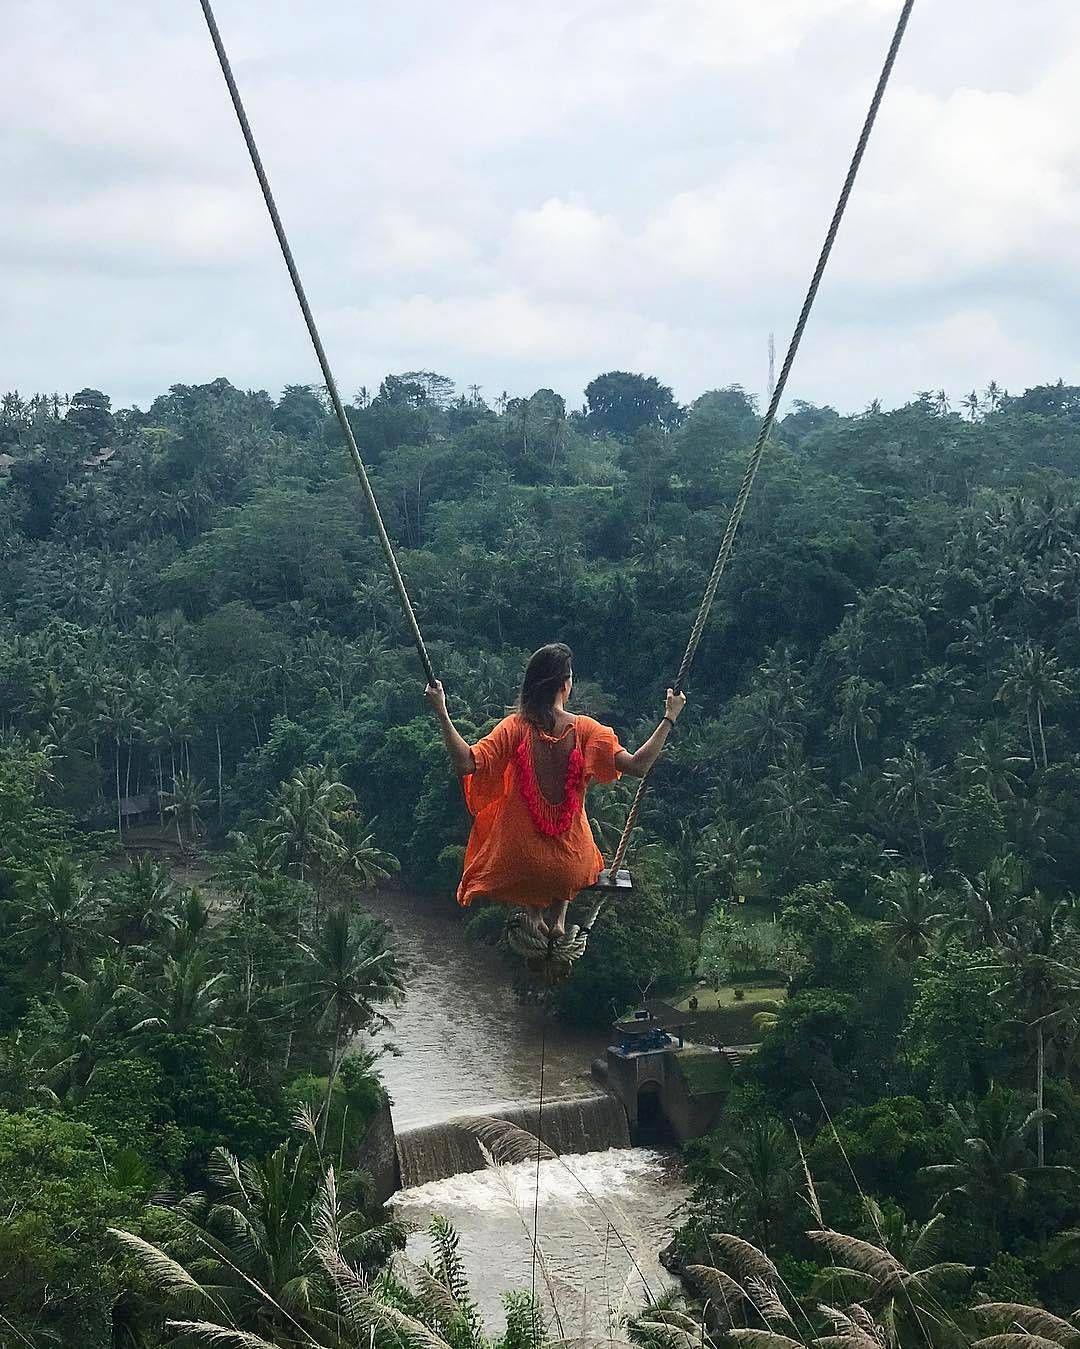 Swinging in the wood Ubud, Bali, Indonesia Photo